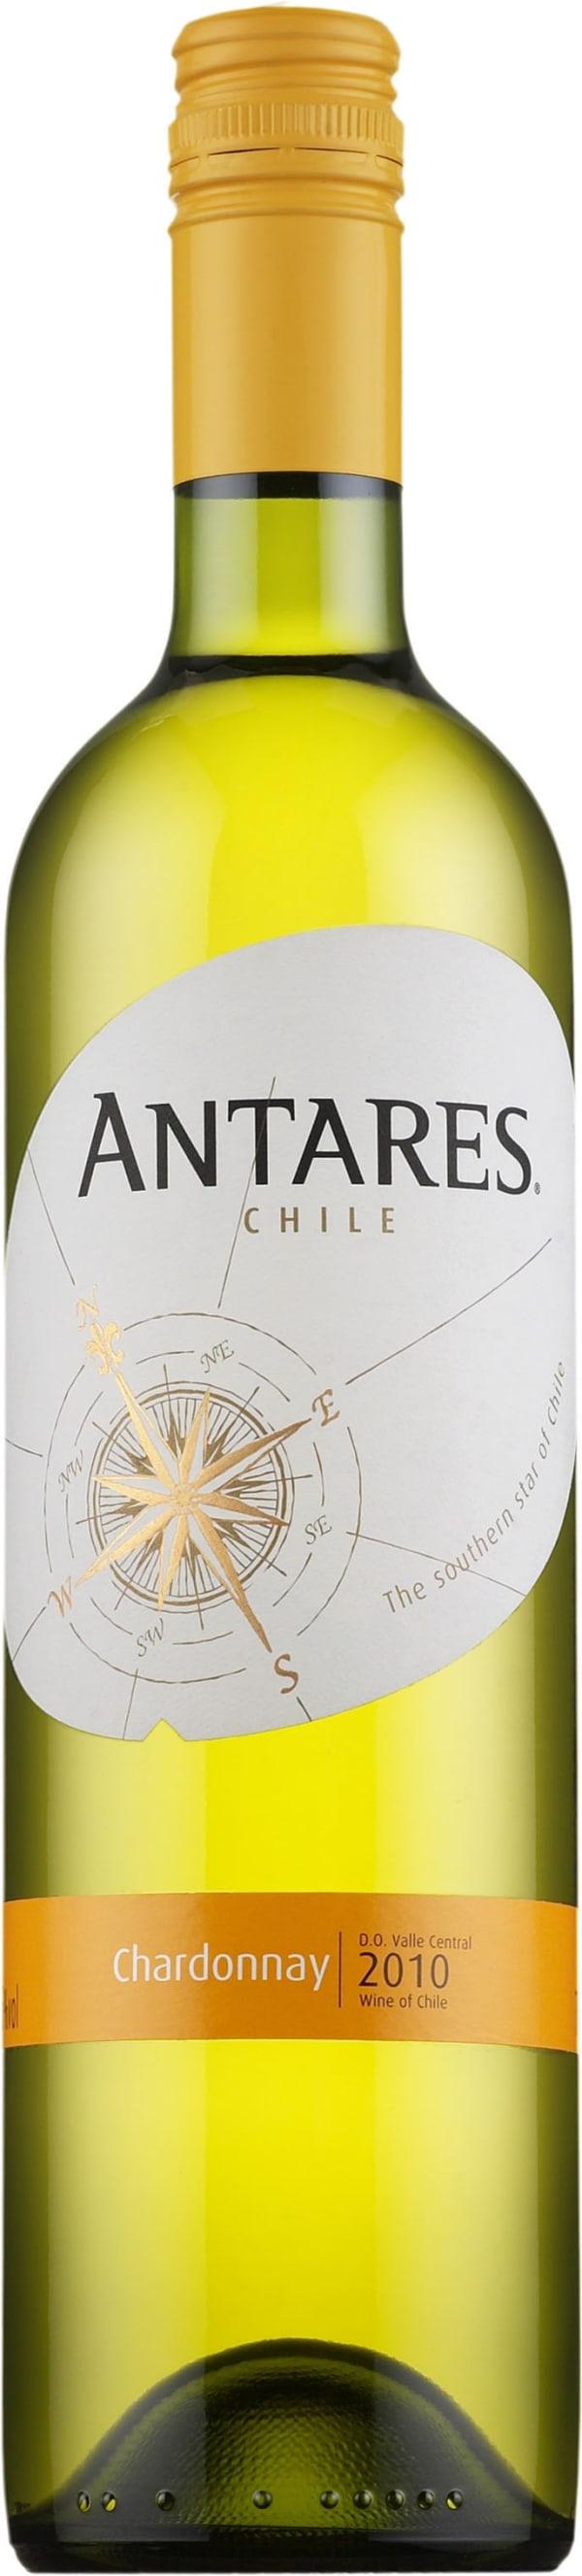 Antares Chardonnay 2016